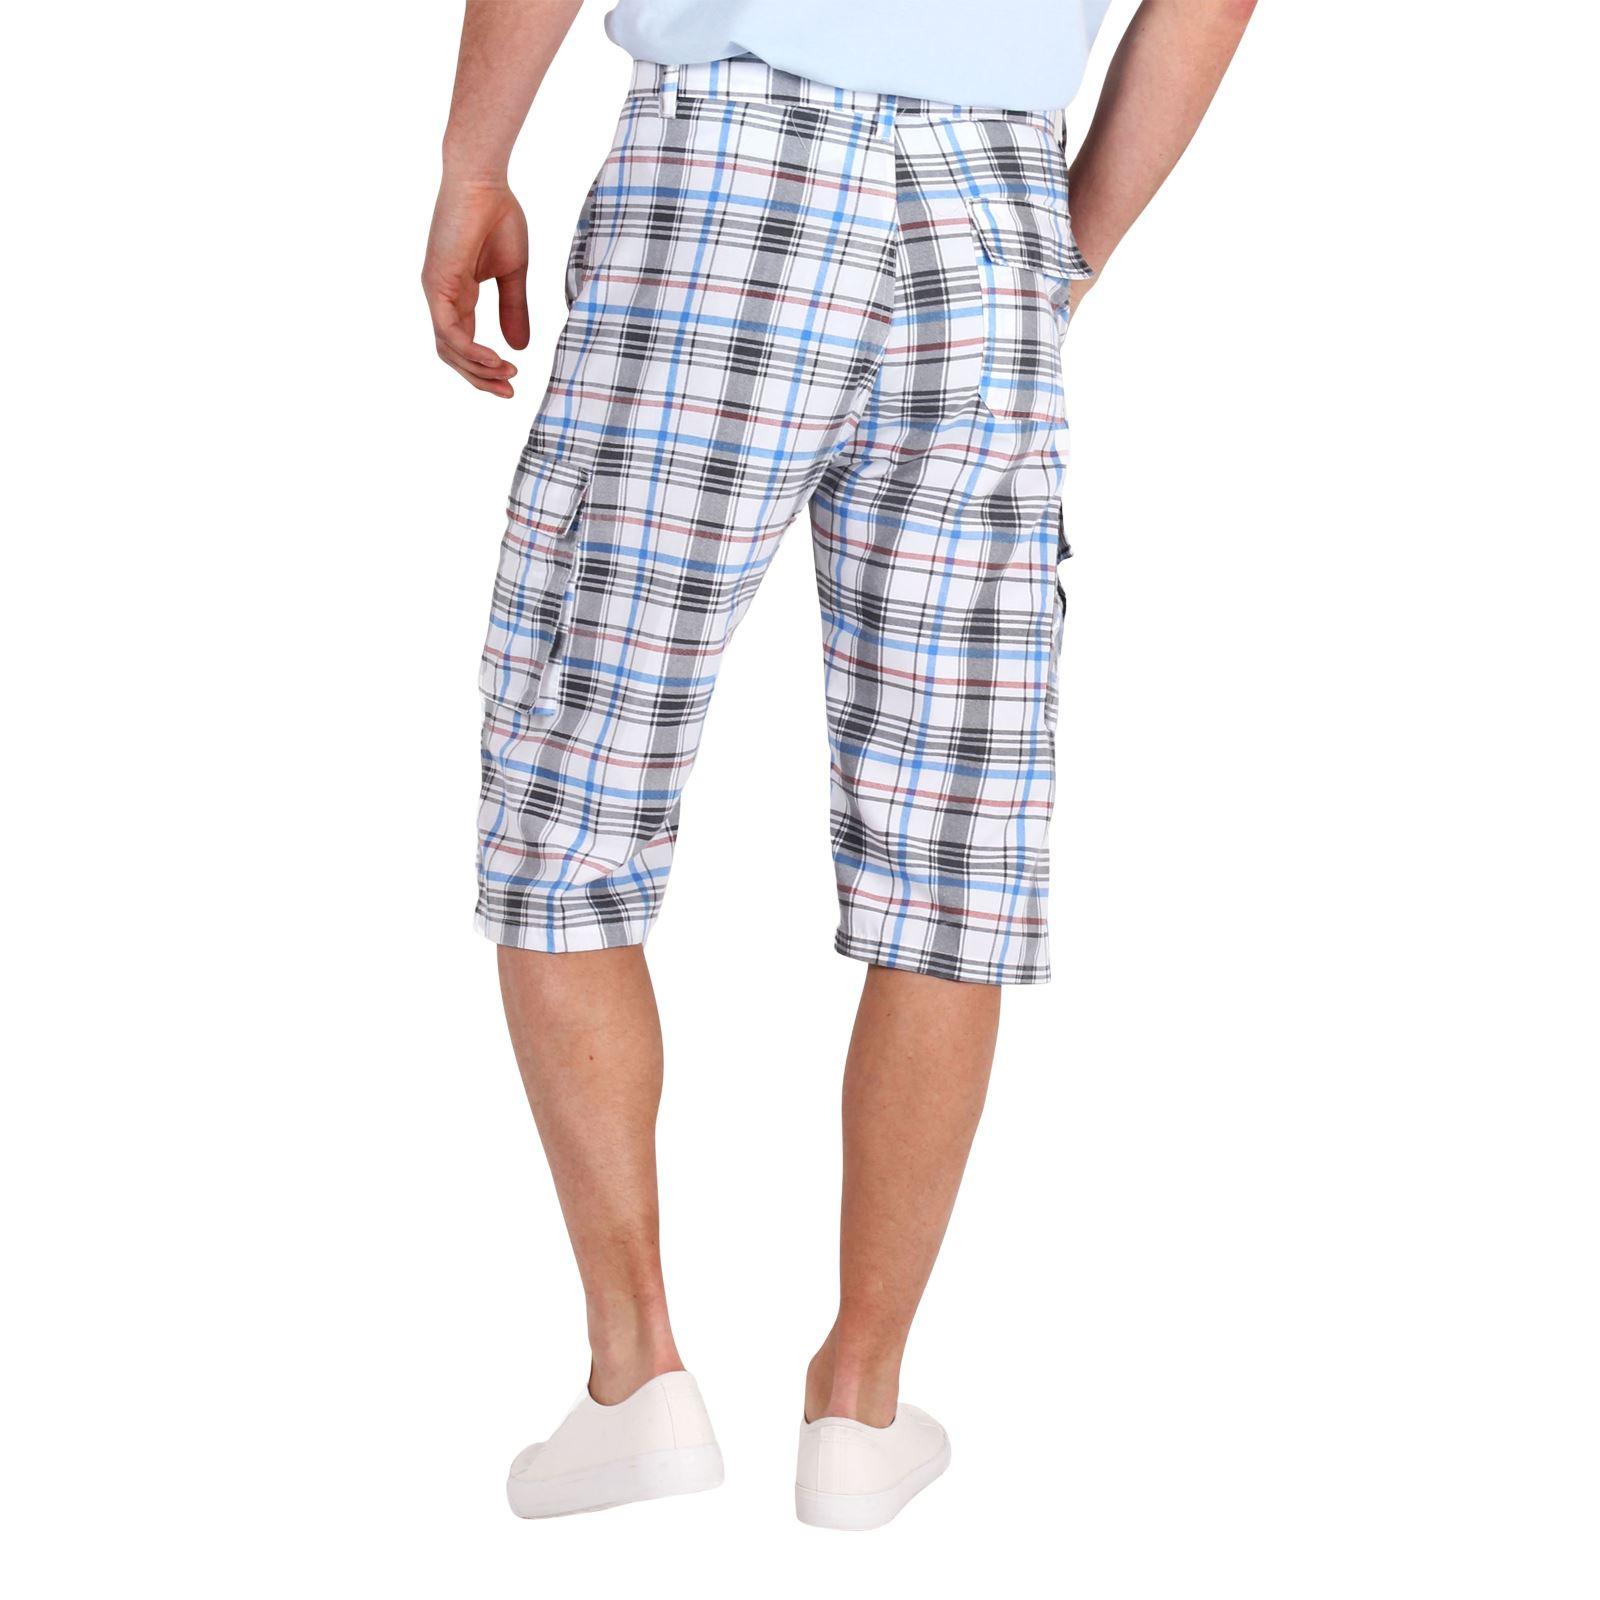 herren 3 4 karierte sommer shorts kurze hose bermuda cargo freizeithose karo ebay. Black Bedroom Furniture Sets. Home Design Ideas